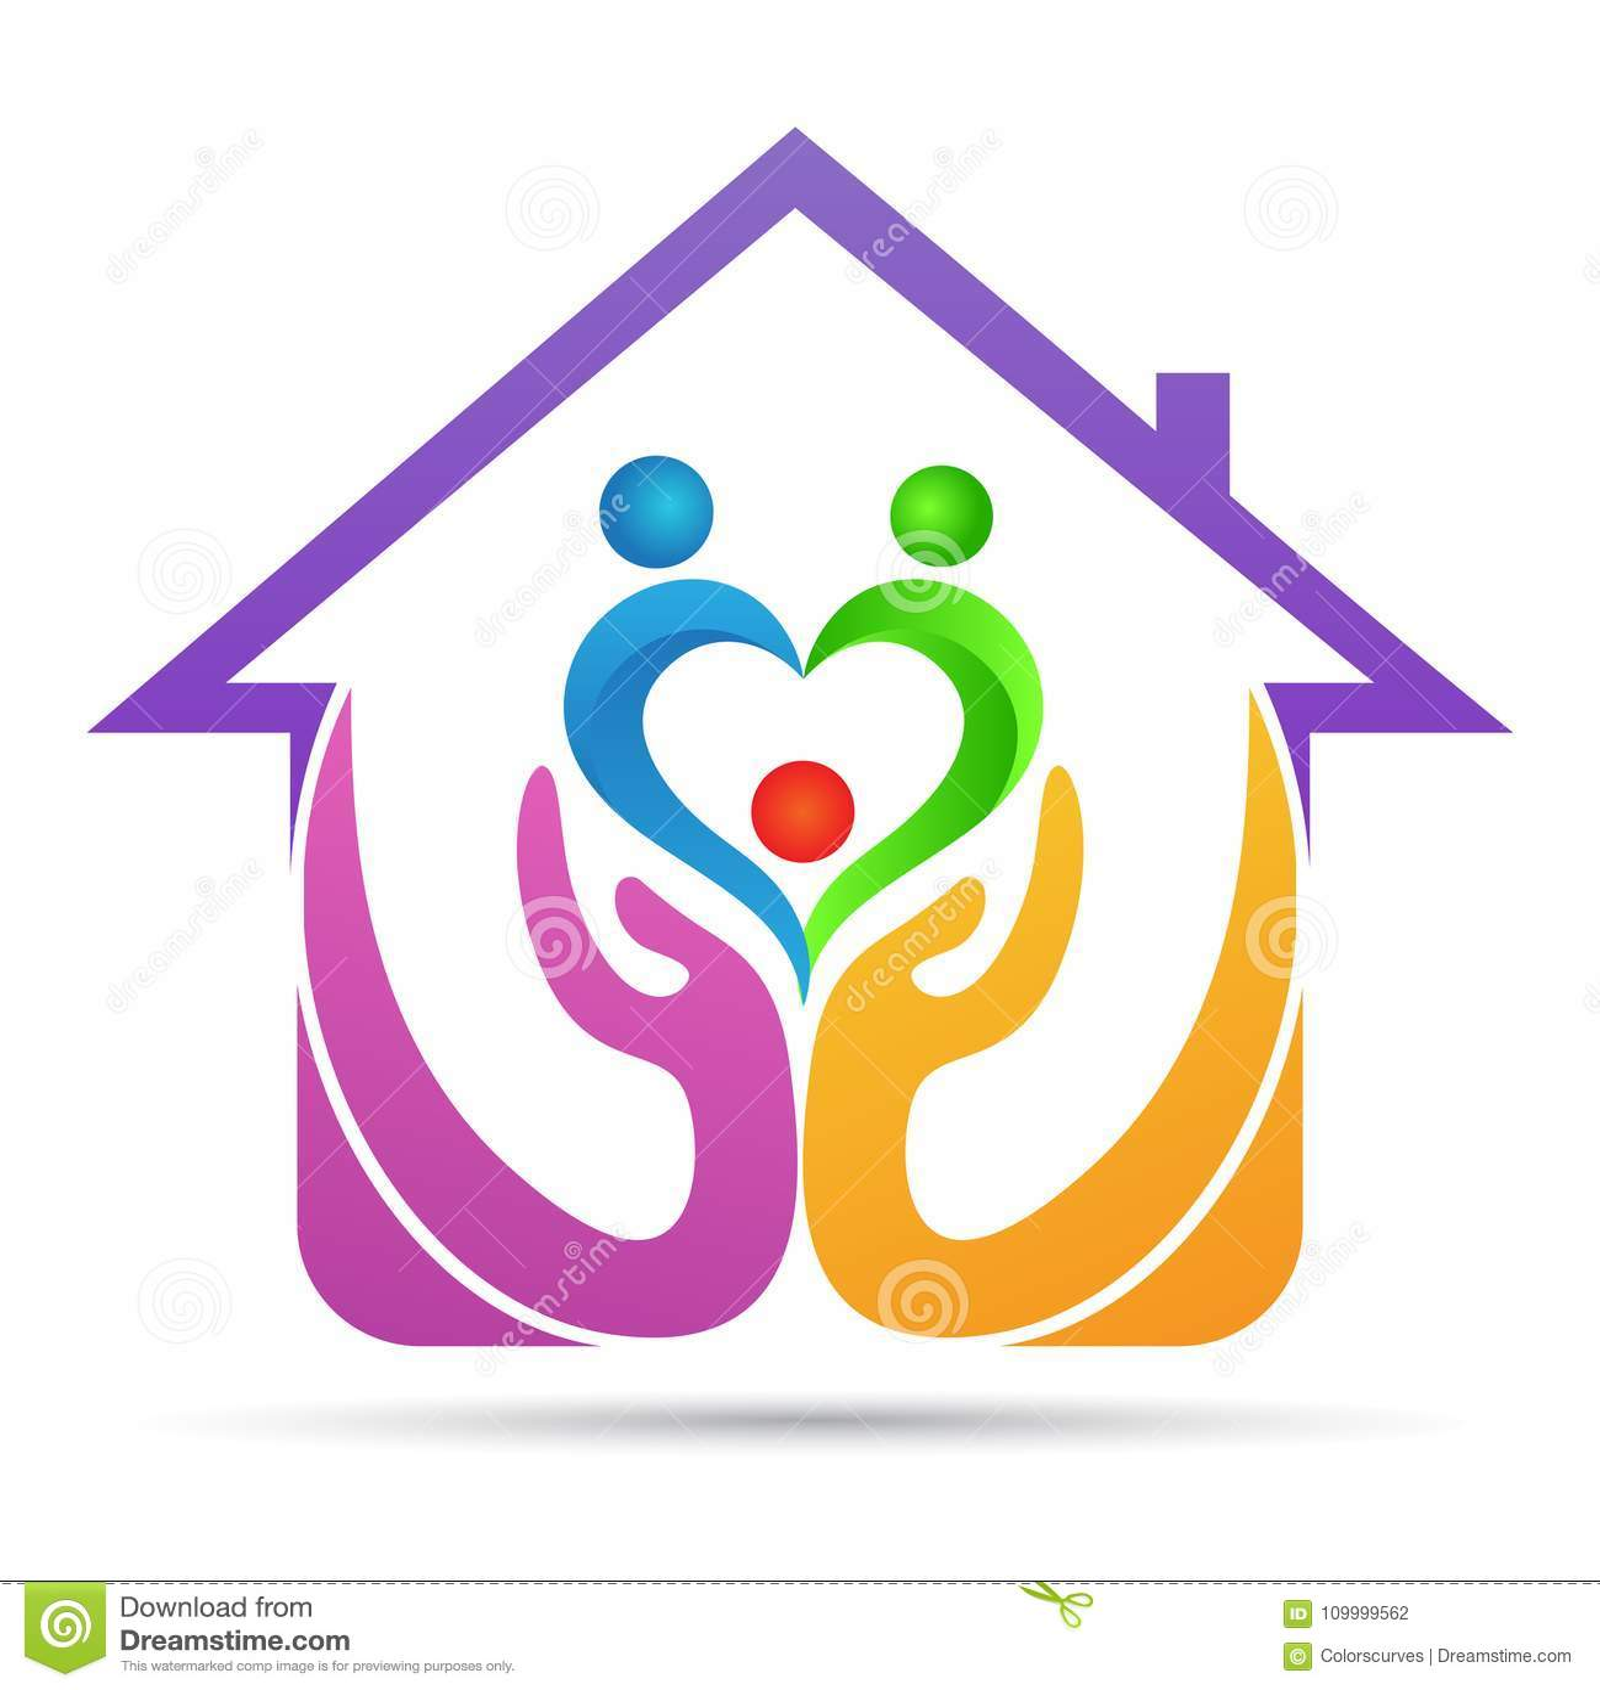 Home trust care people elder couple family love logo design